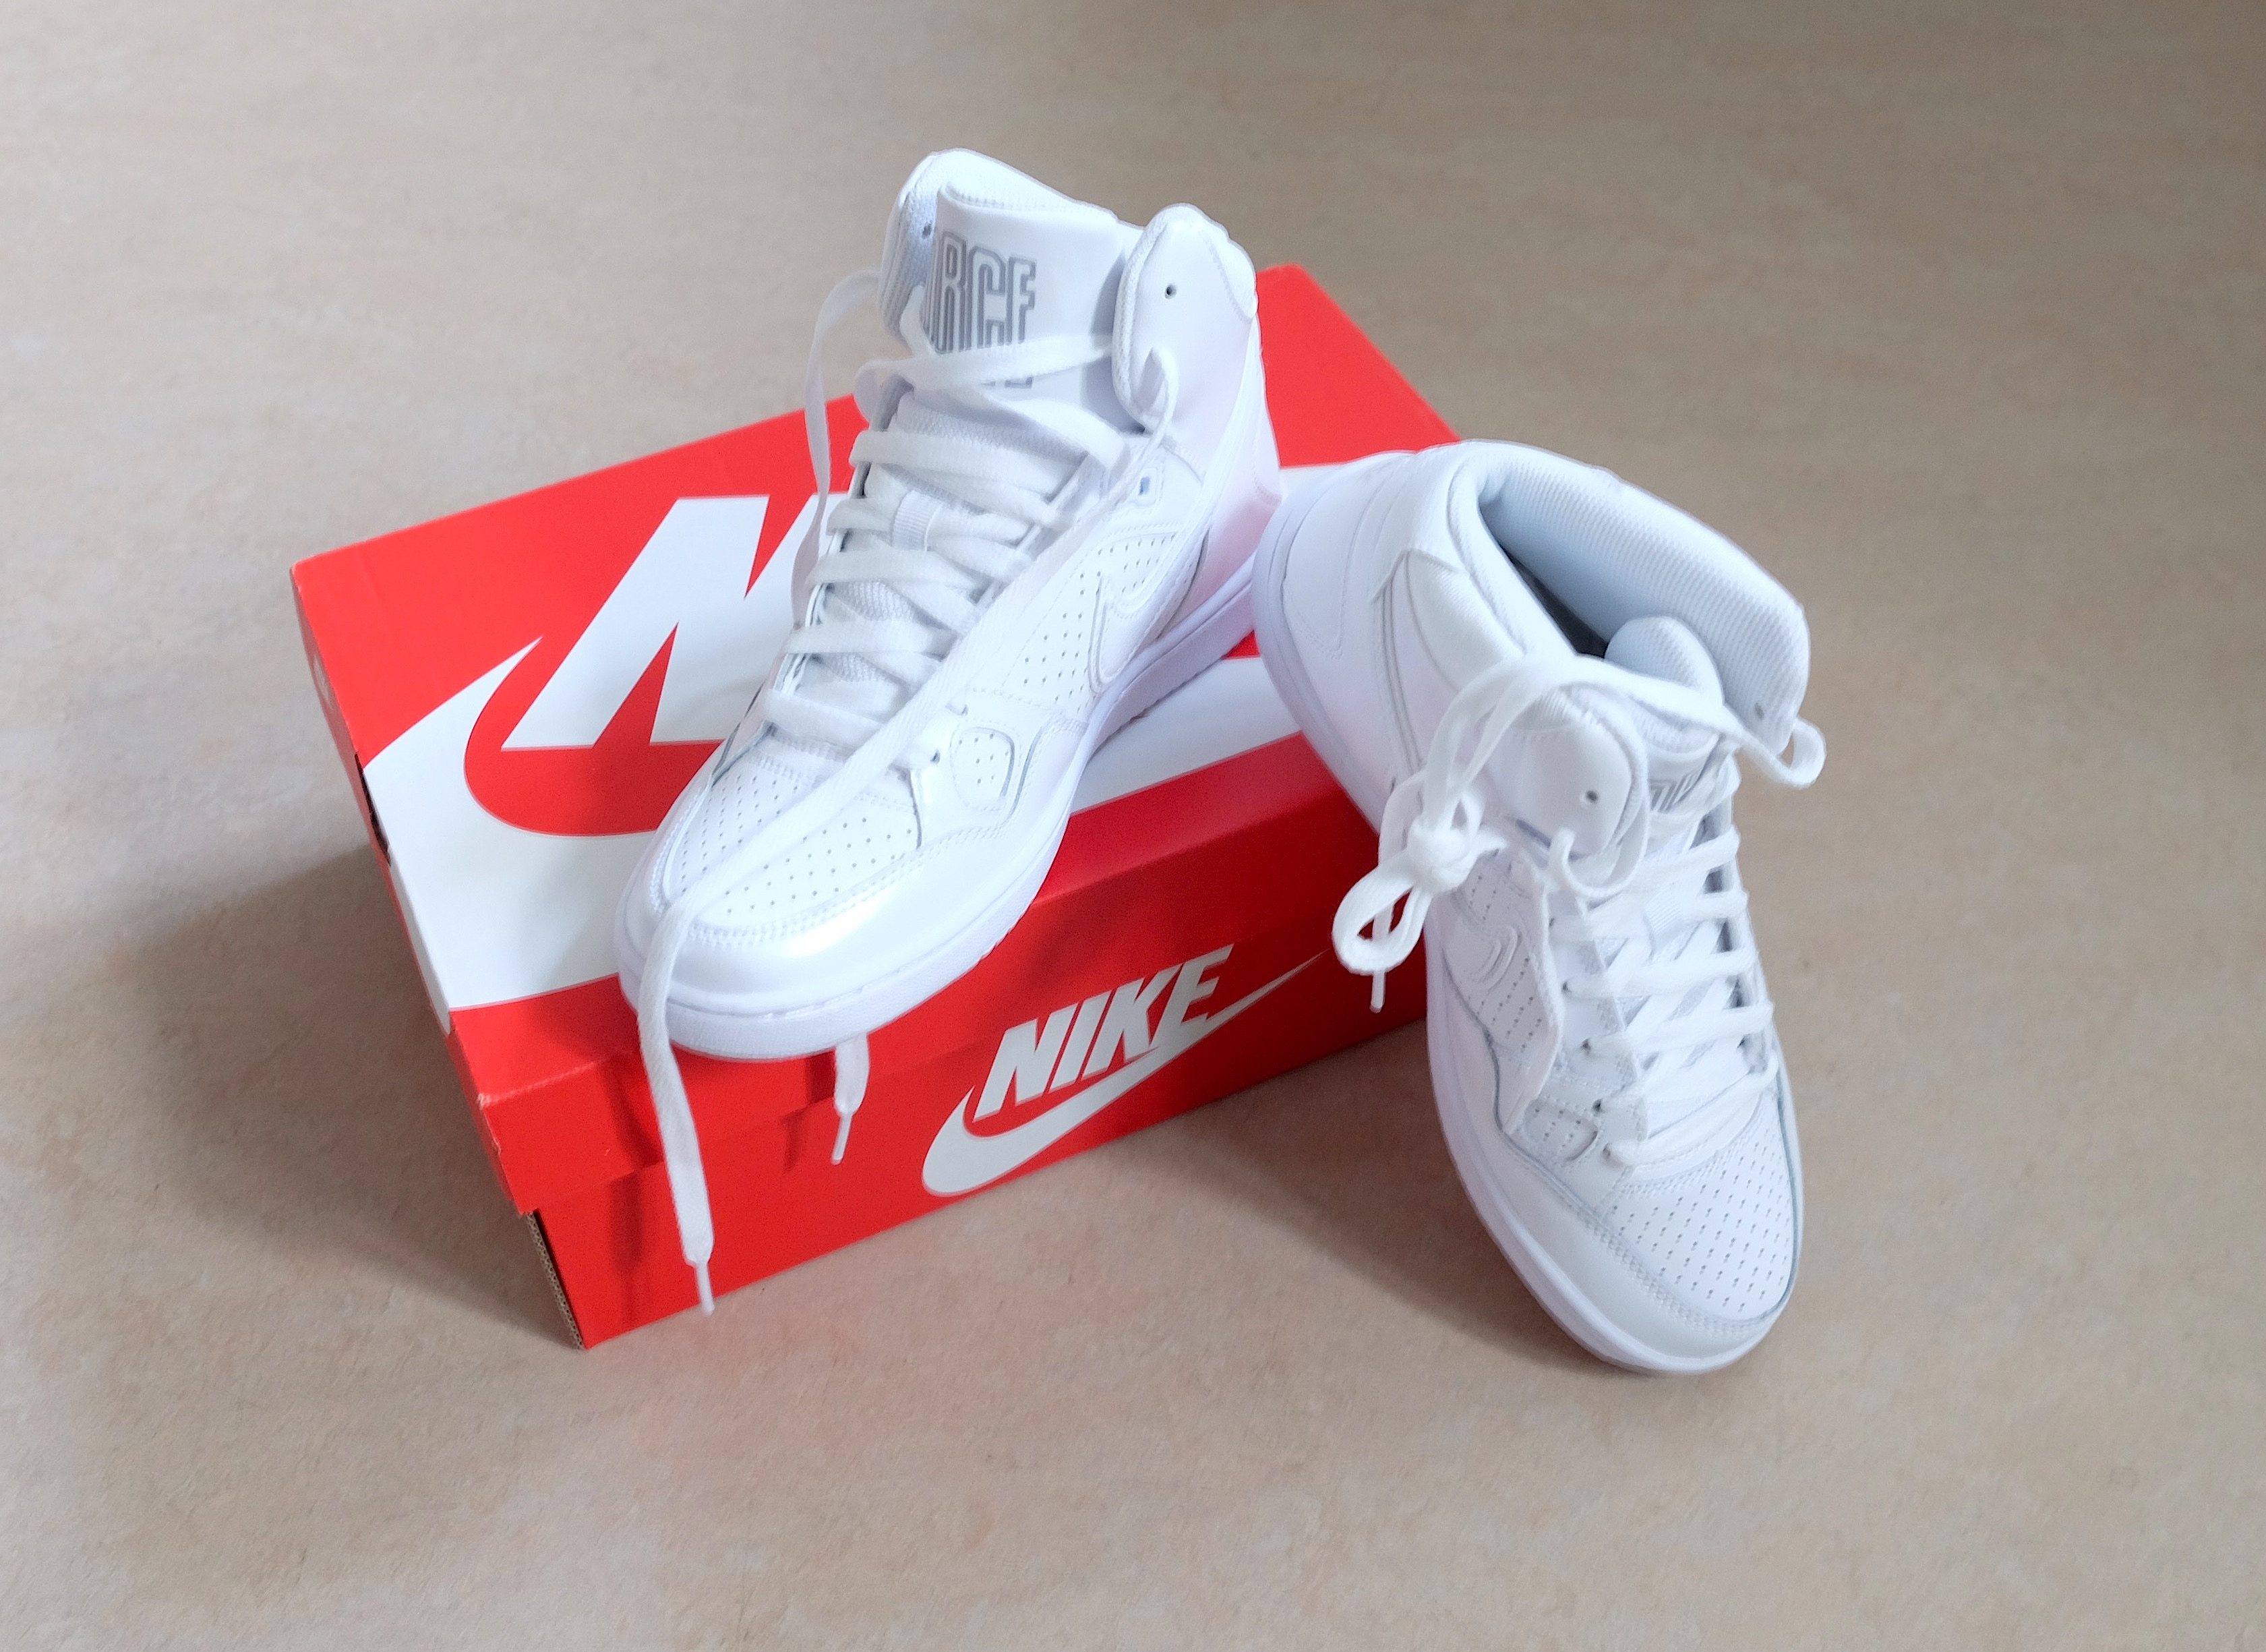 Nike Air Fashionable Shoes